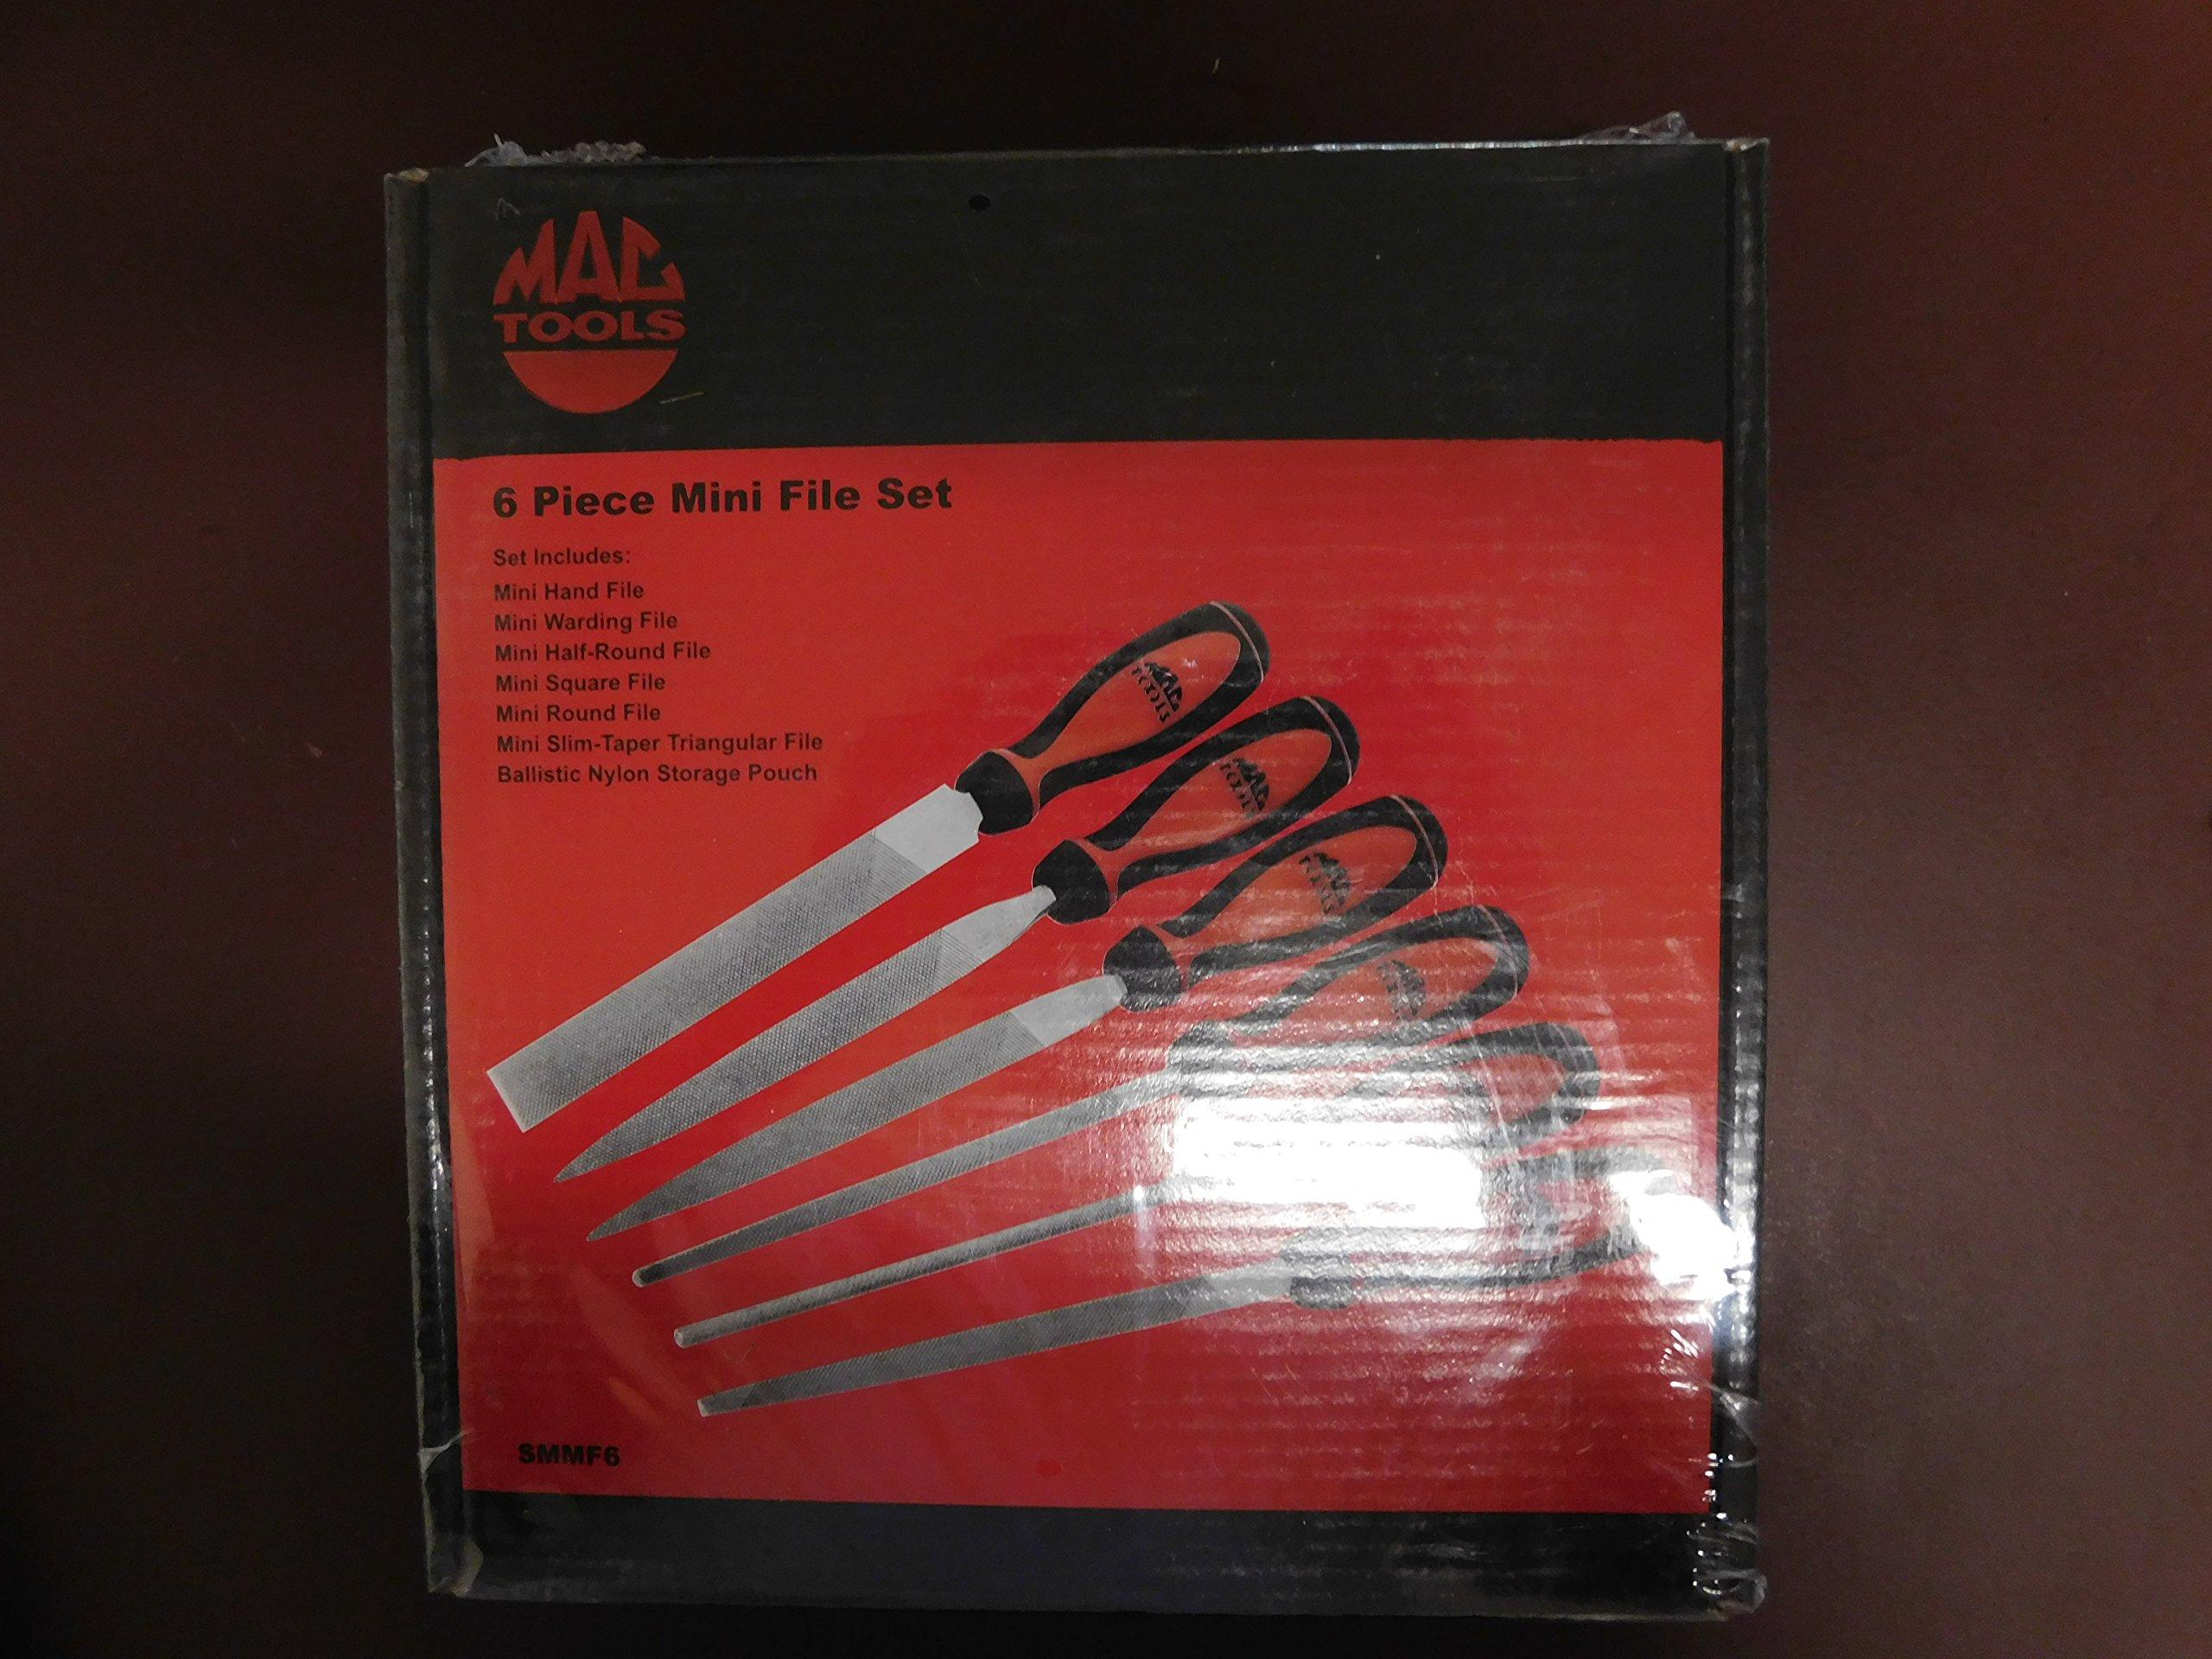 Mac Tools 6 Piece Mini File Set, Part #SMMF6